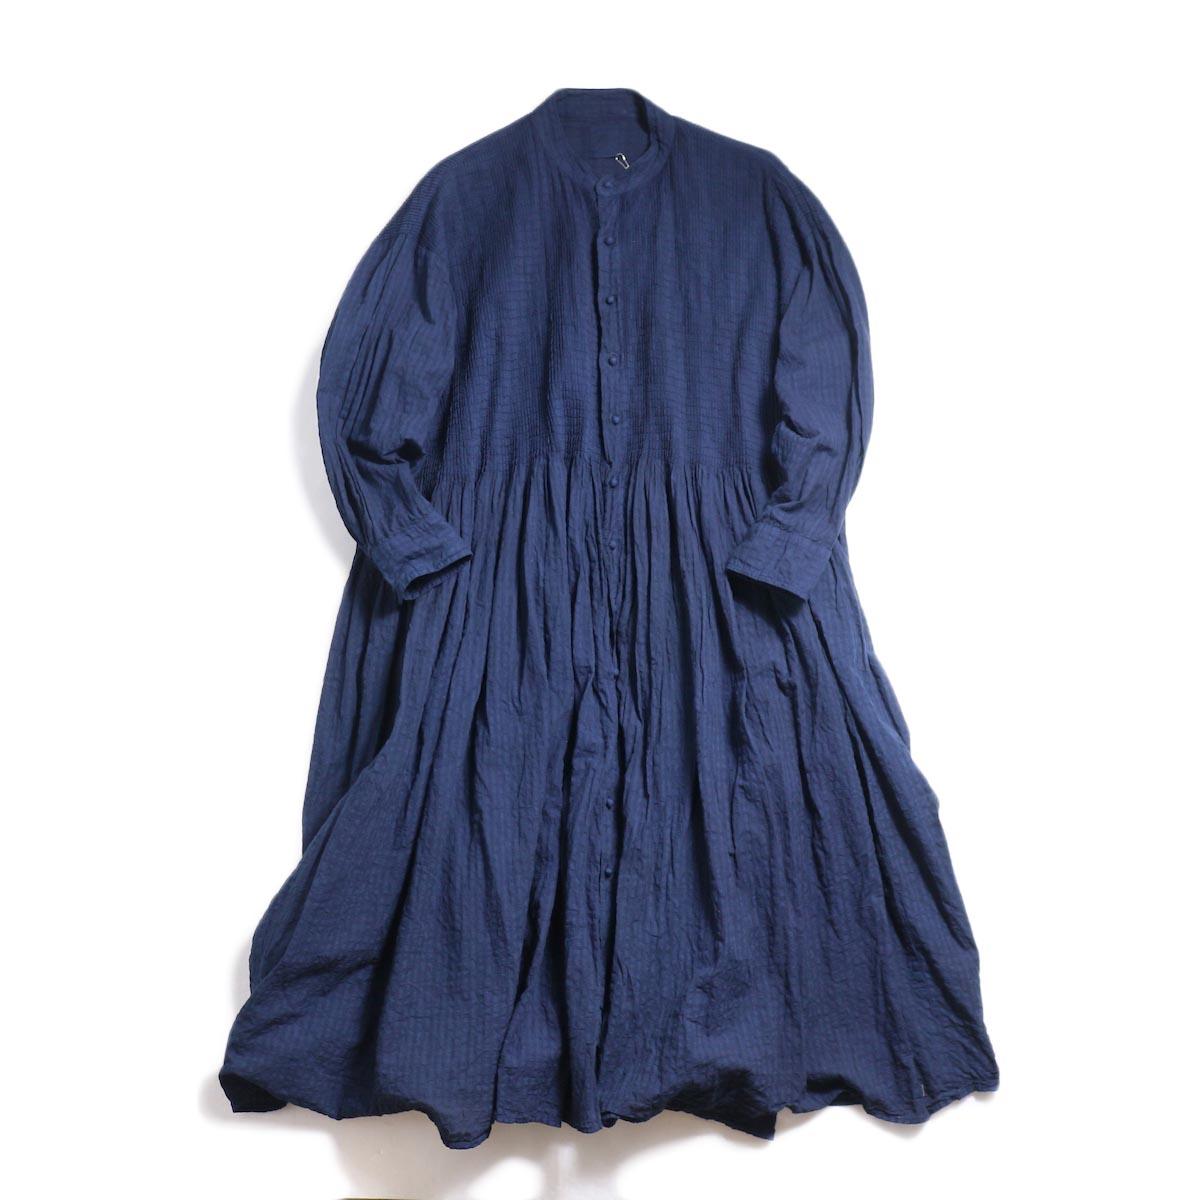 maison de soil / Banded Shirt Dress With Mini Pintuck -Indigo